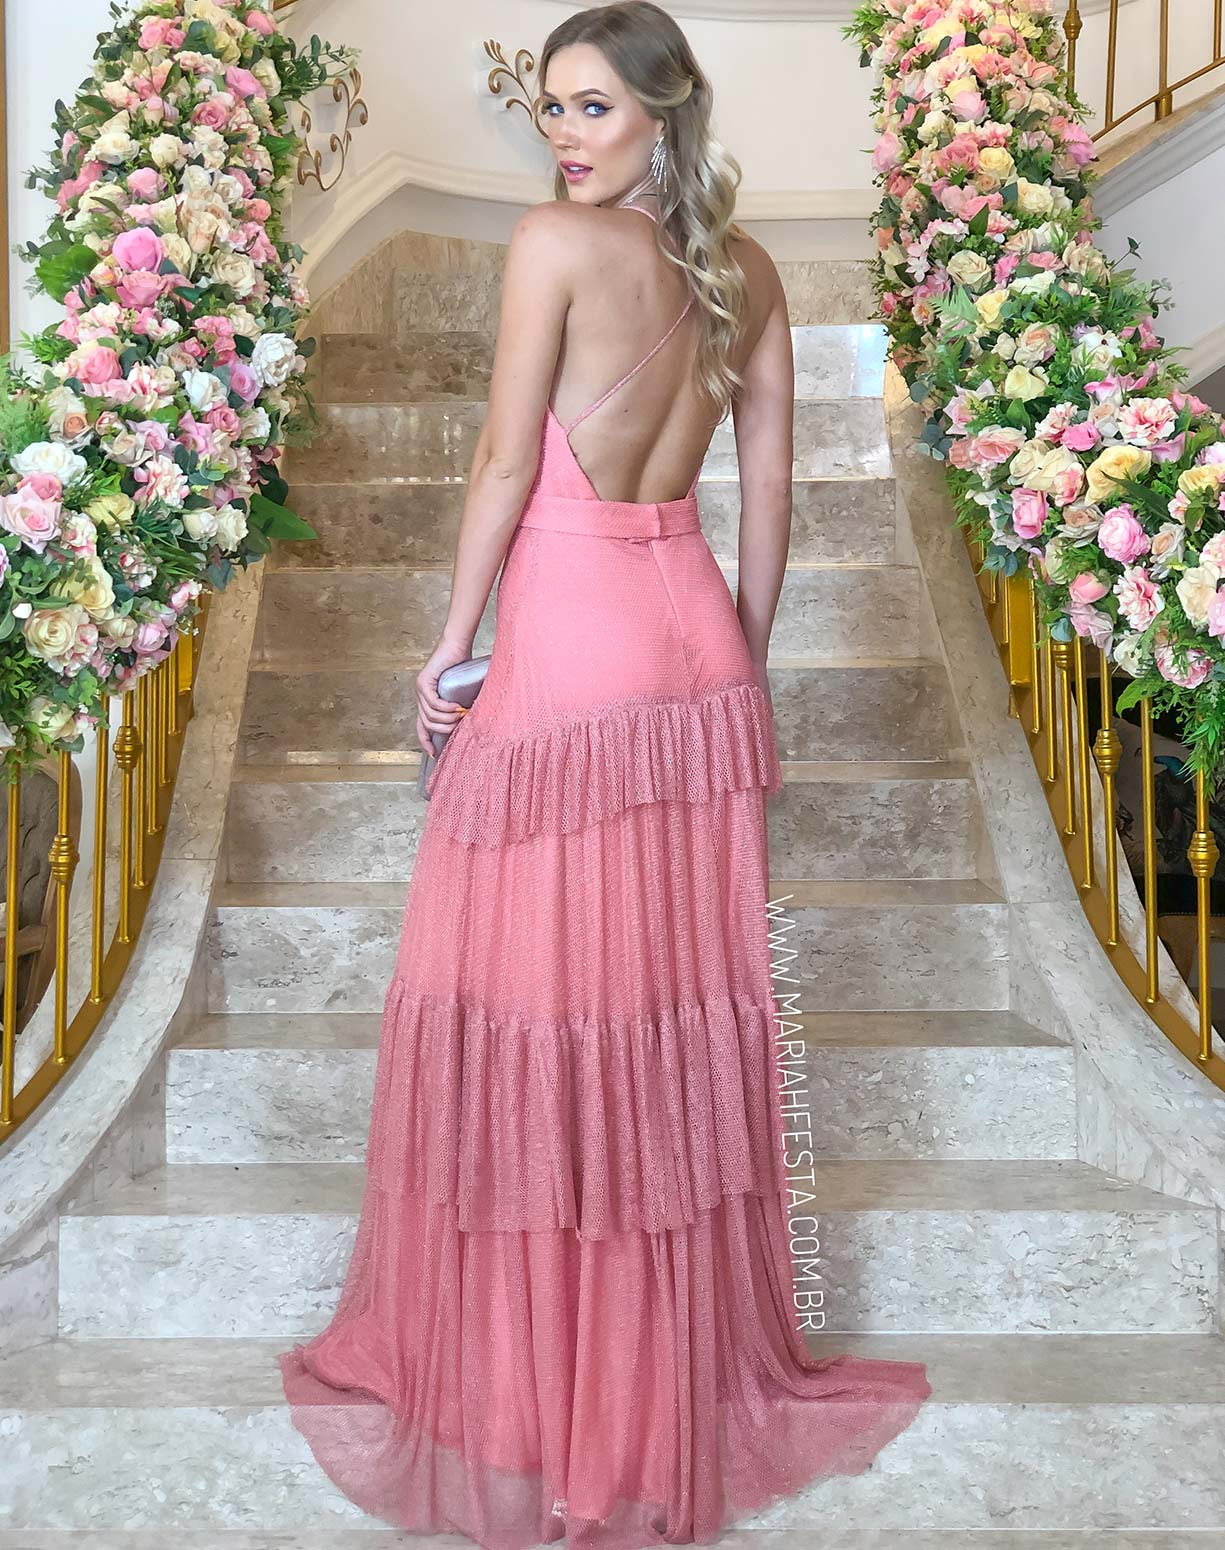 Vestido Rosa em Tule Tela com Glitter